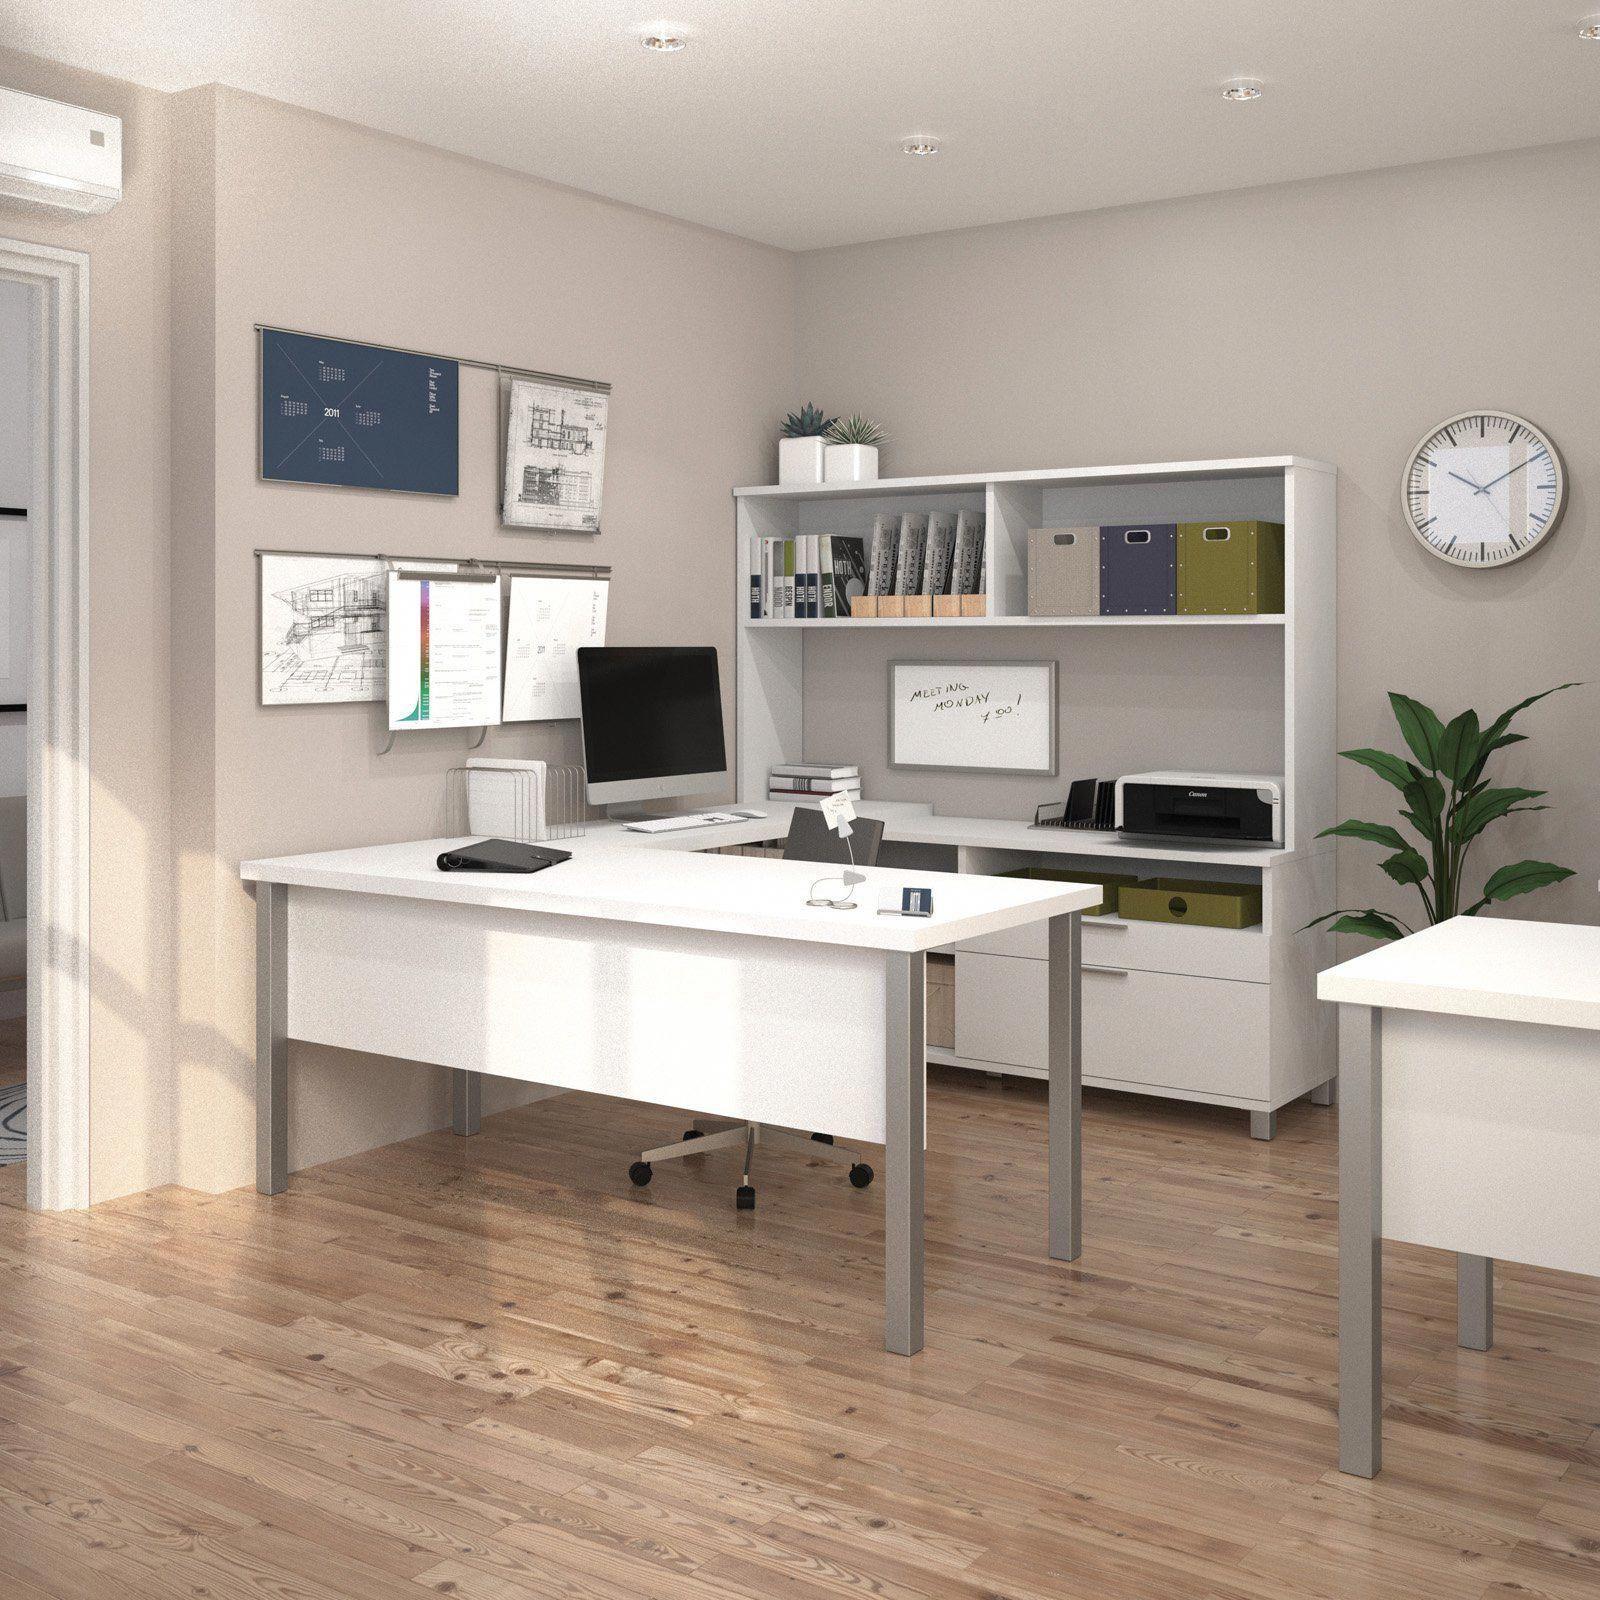 Pin On Modern Office Designs